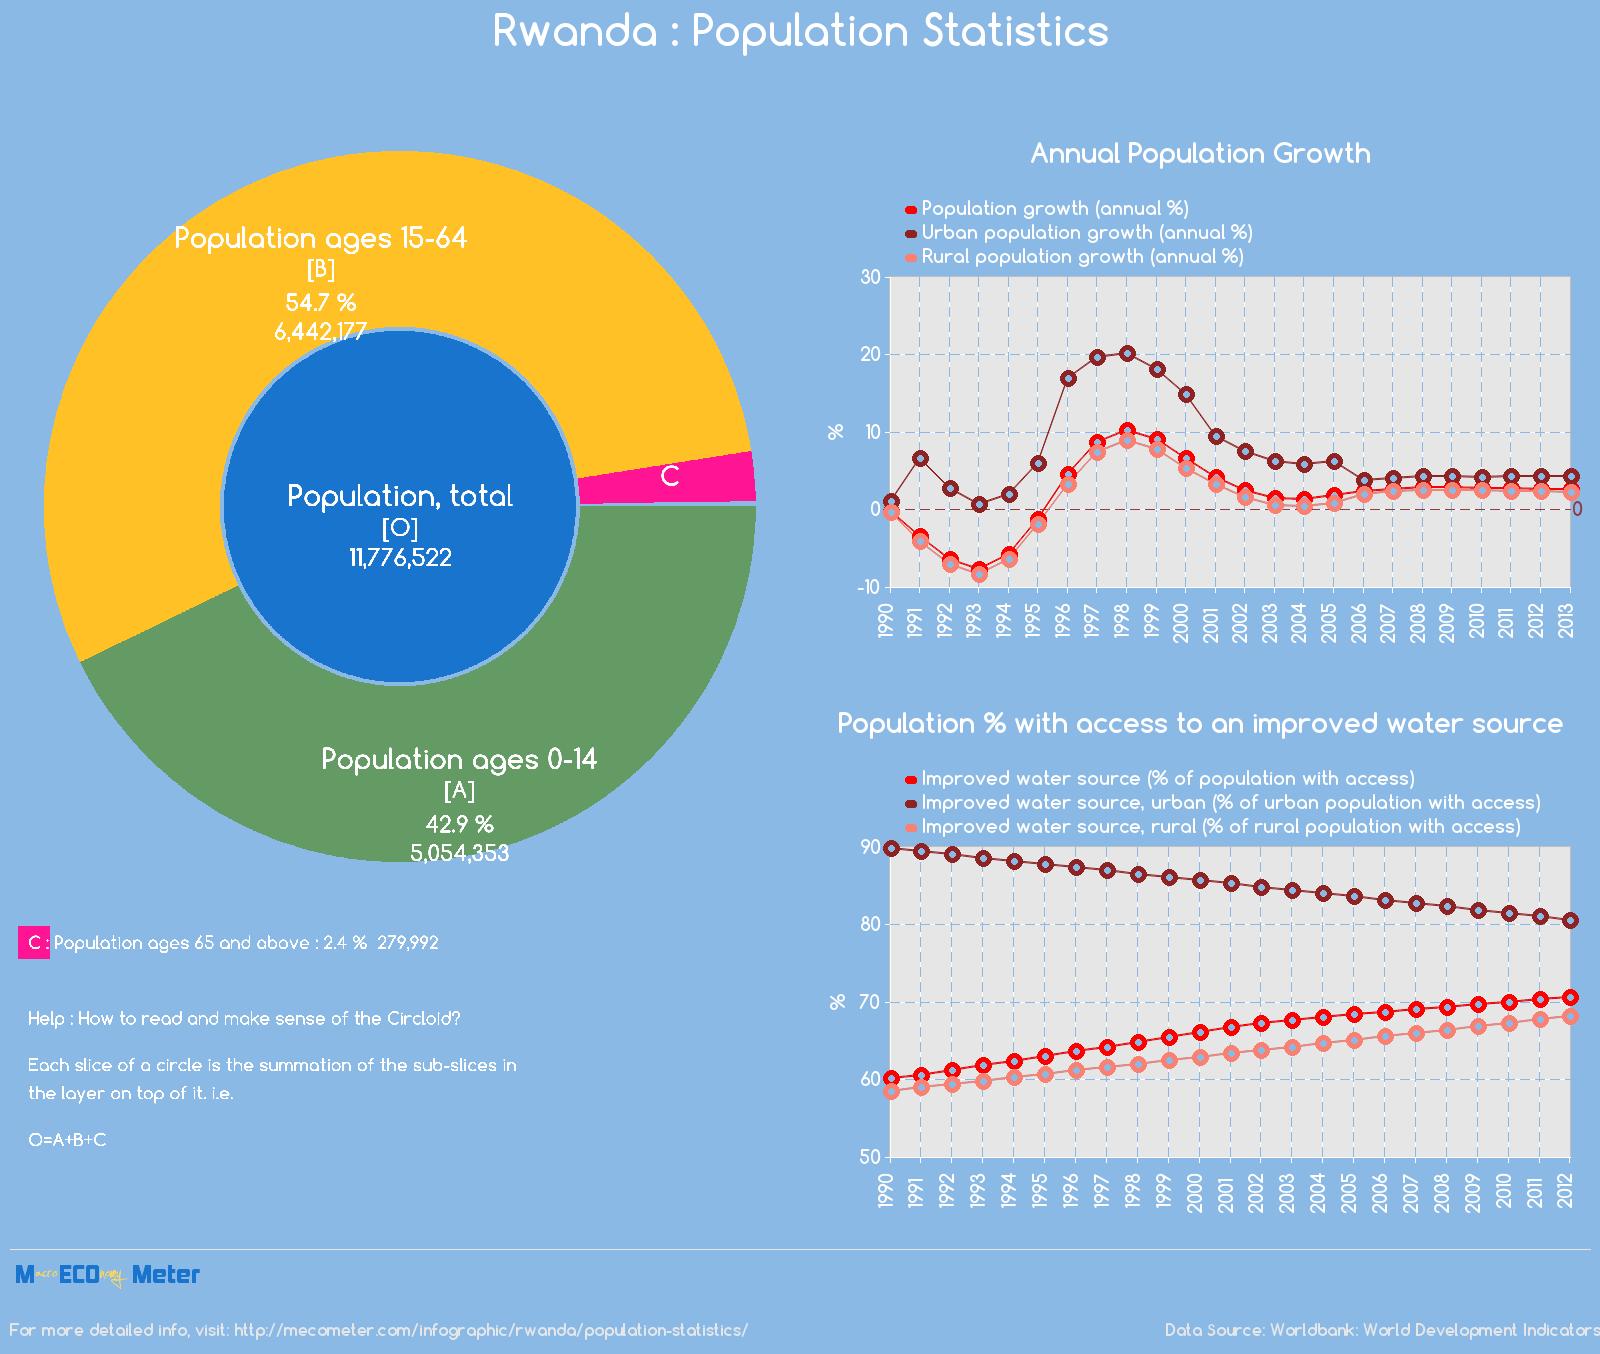 Rwanda : Population Statistics